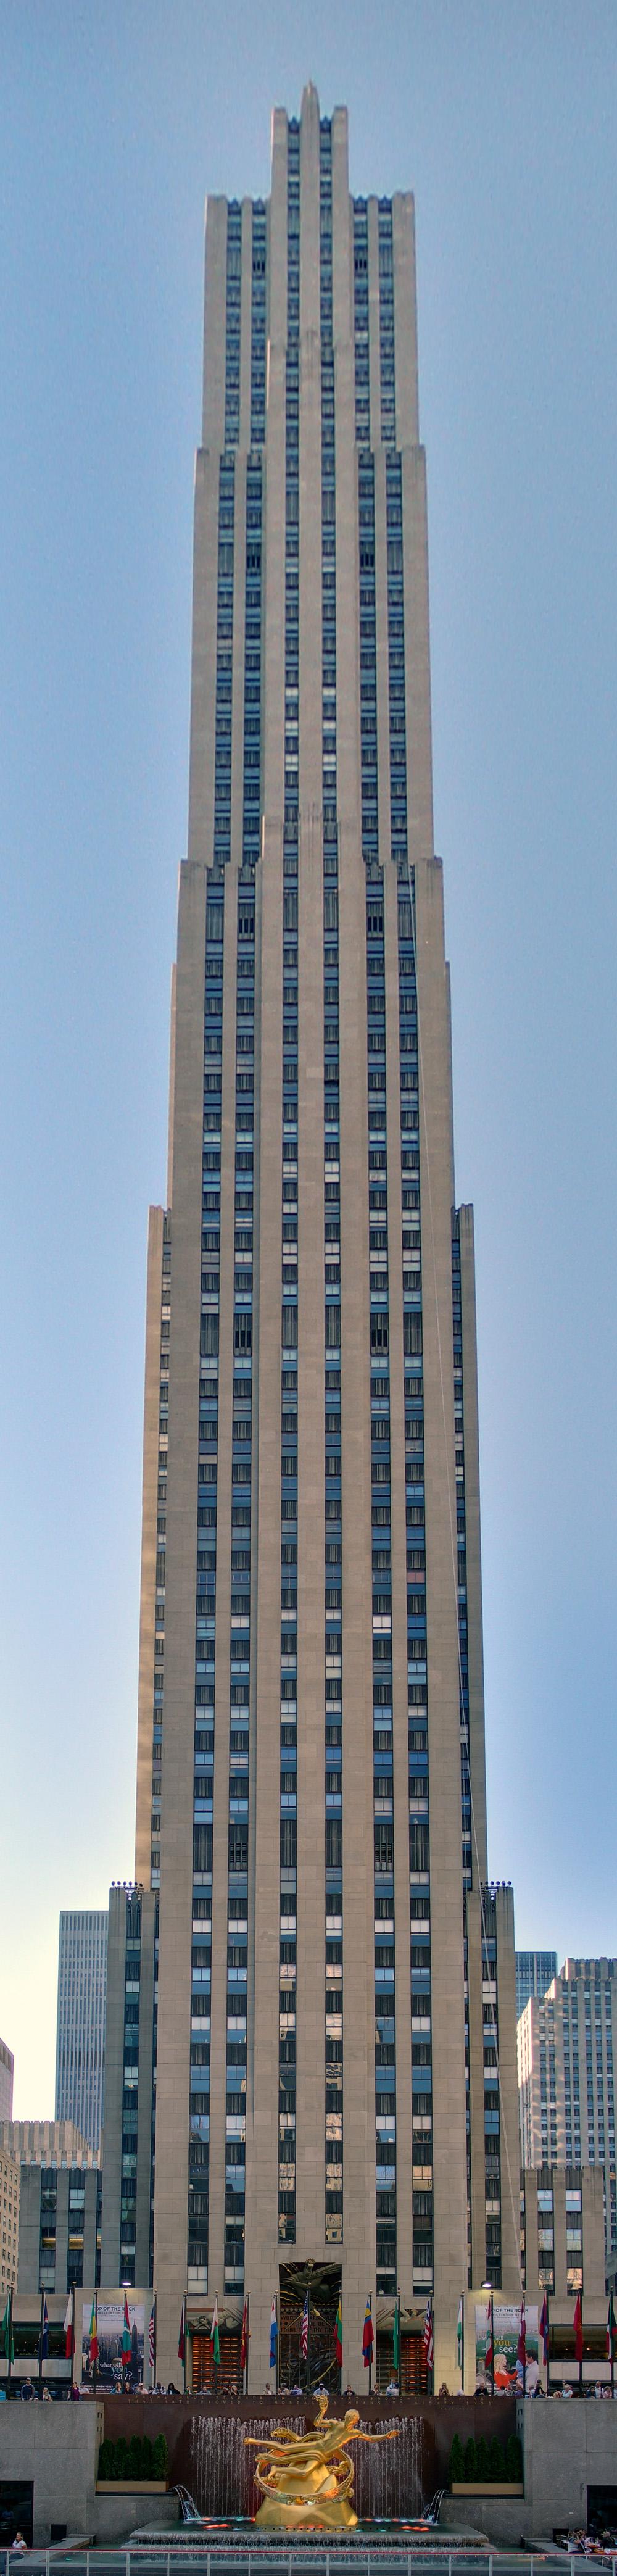 29-new-york-octobre-2008